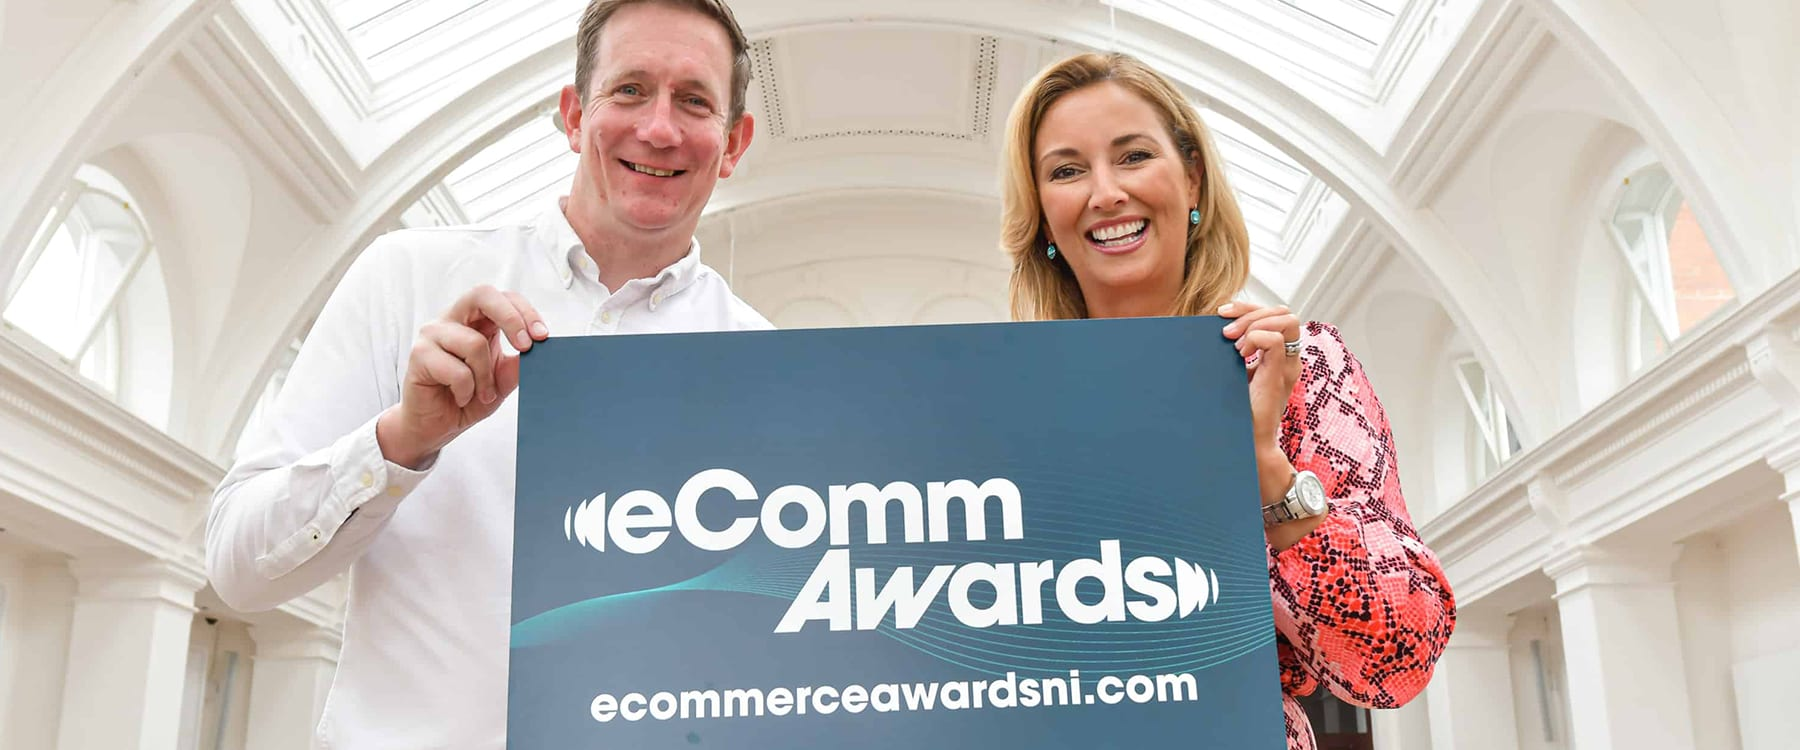 We've been shortlisted – Inaugural NI eCommerce Awards 2019 Image